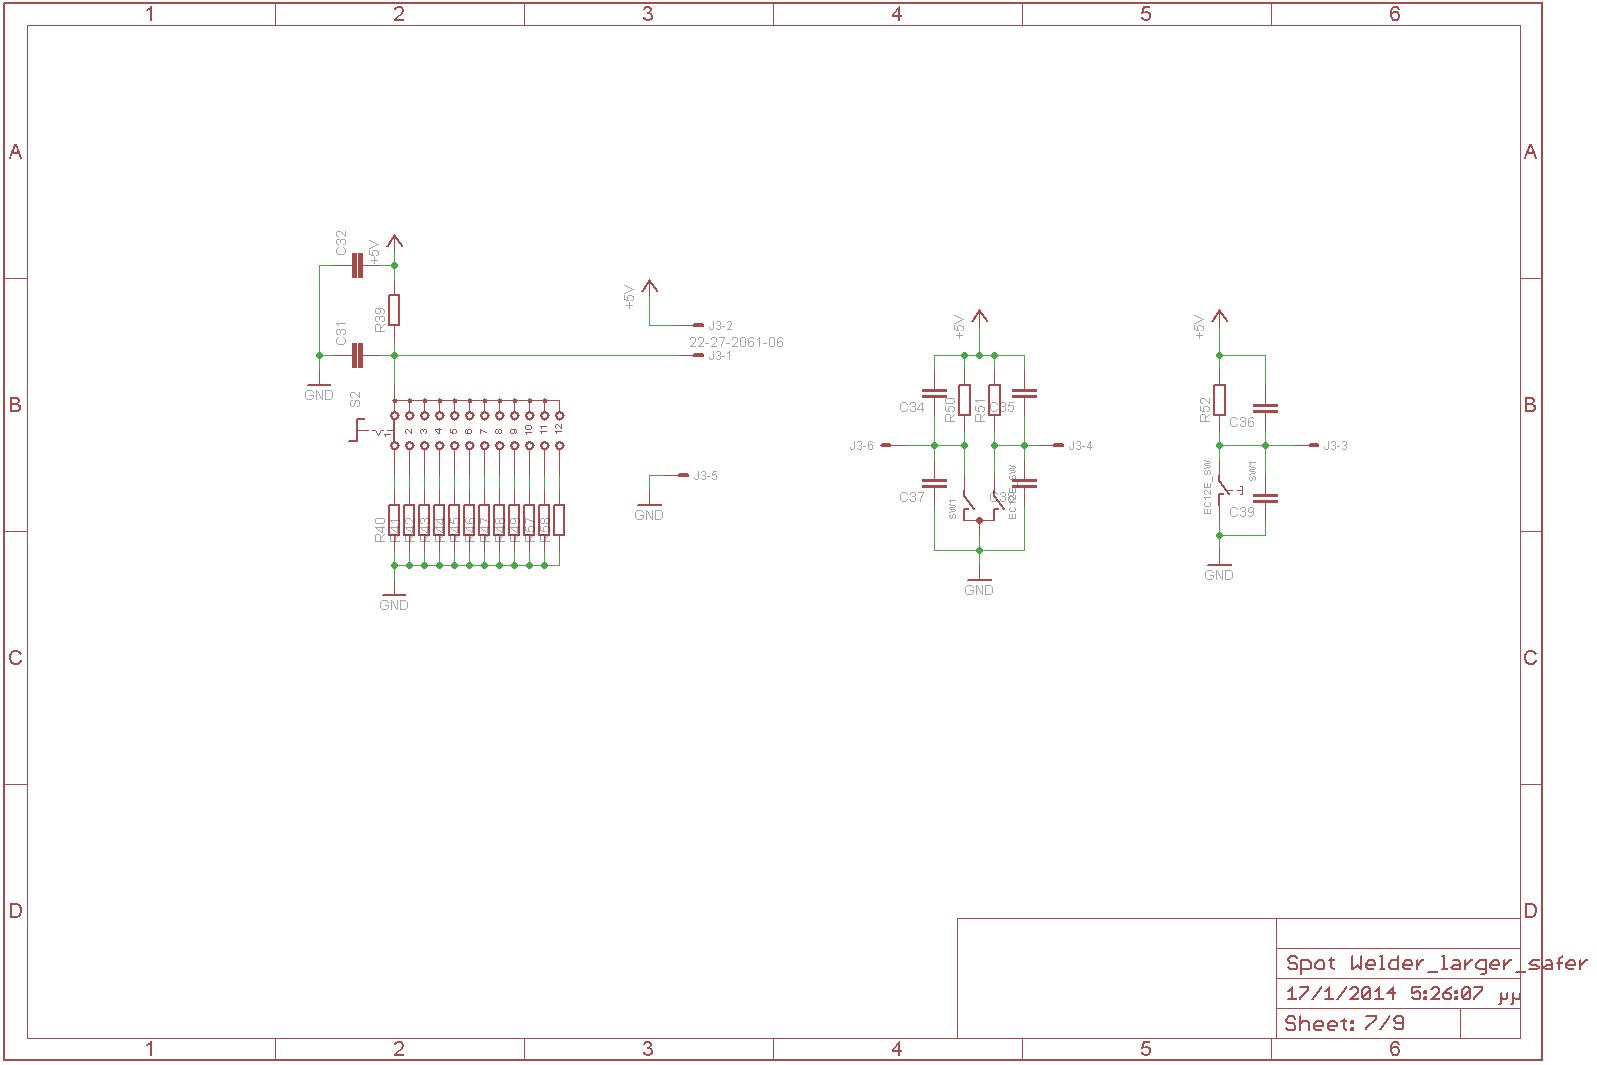 Mcu Controlled Spot Welder Electronics Lab Welding Schematic Diagram Switch